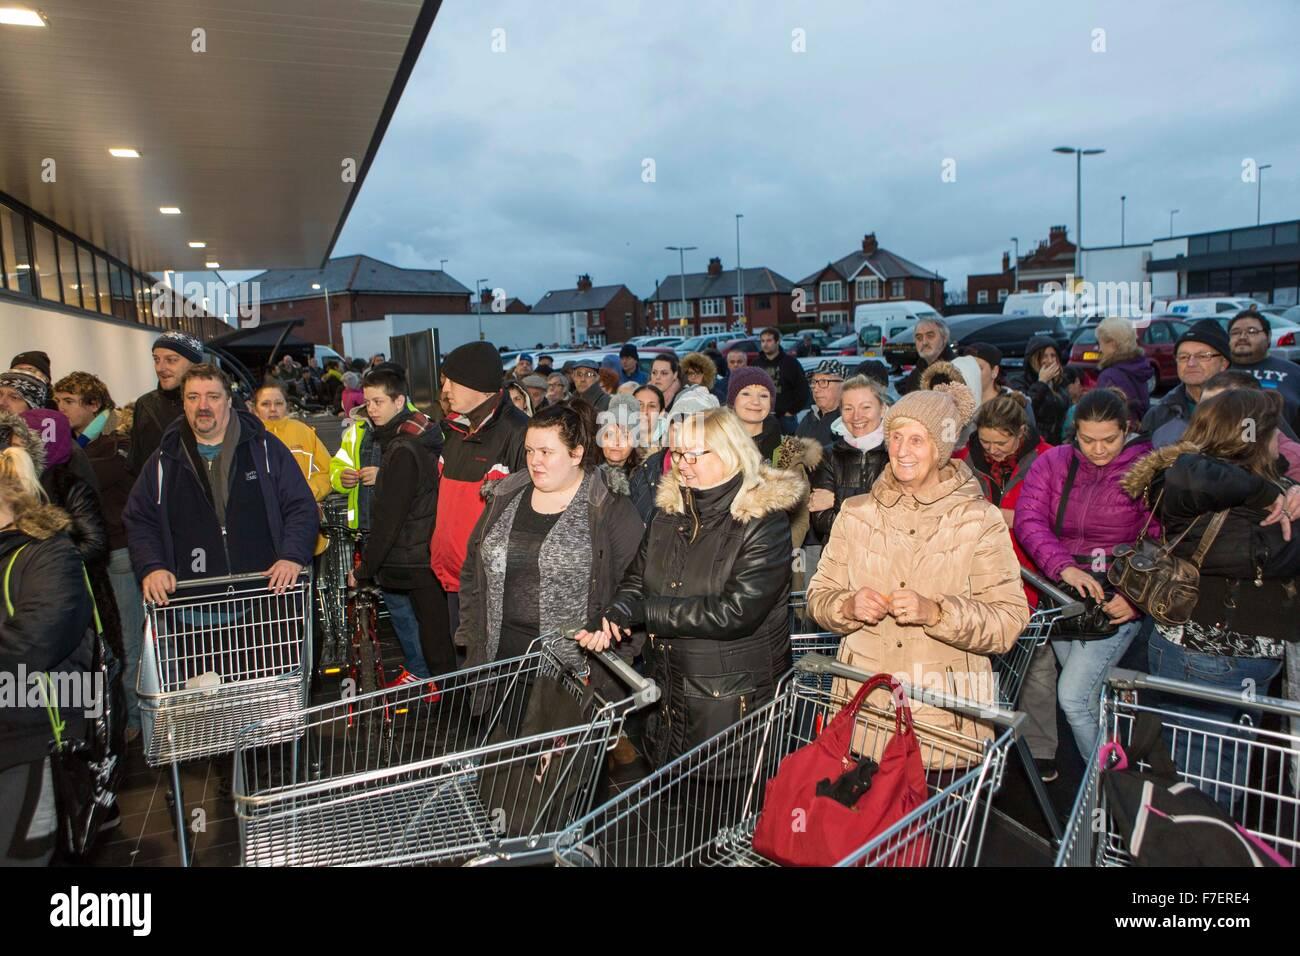 shoppers queue outside a supermarket - Stock Image